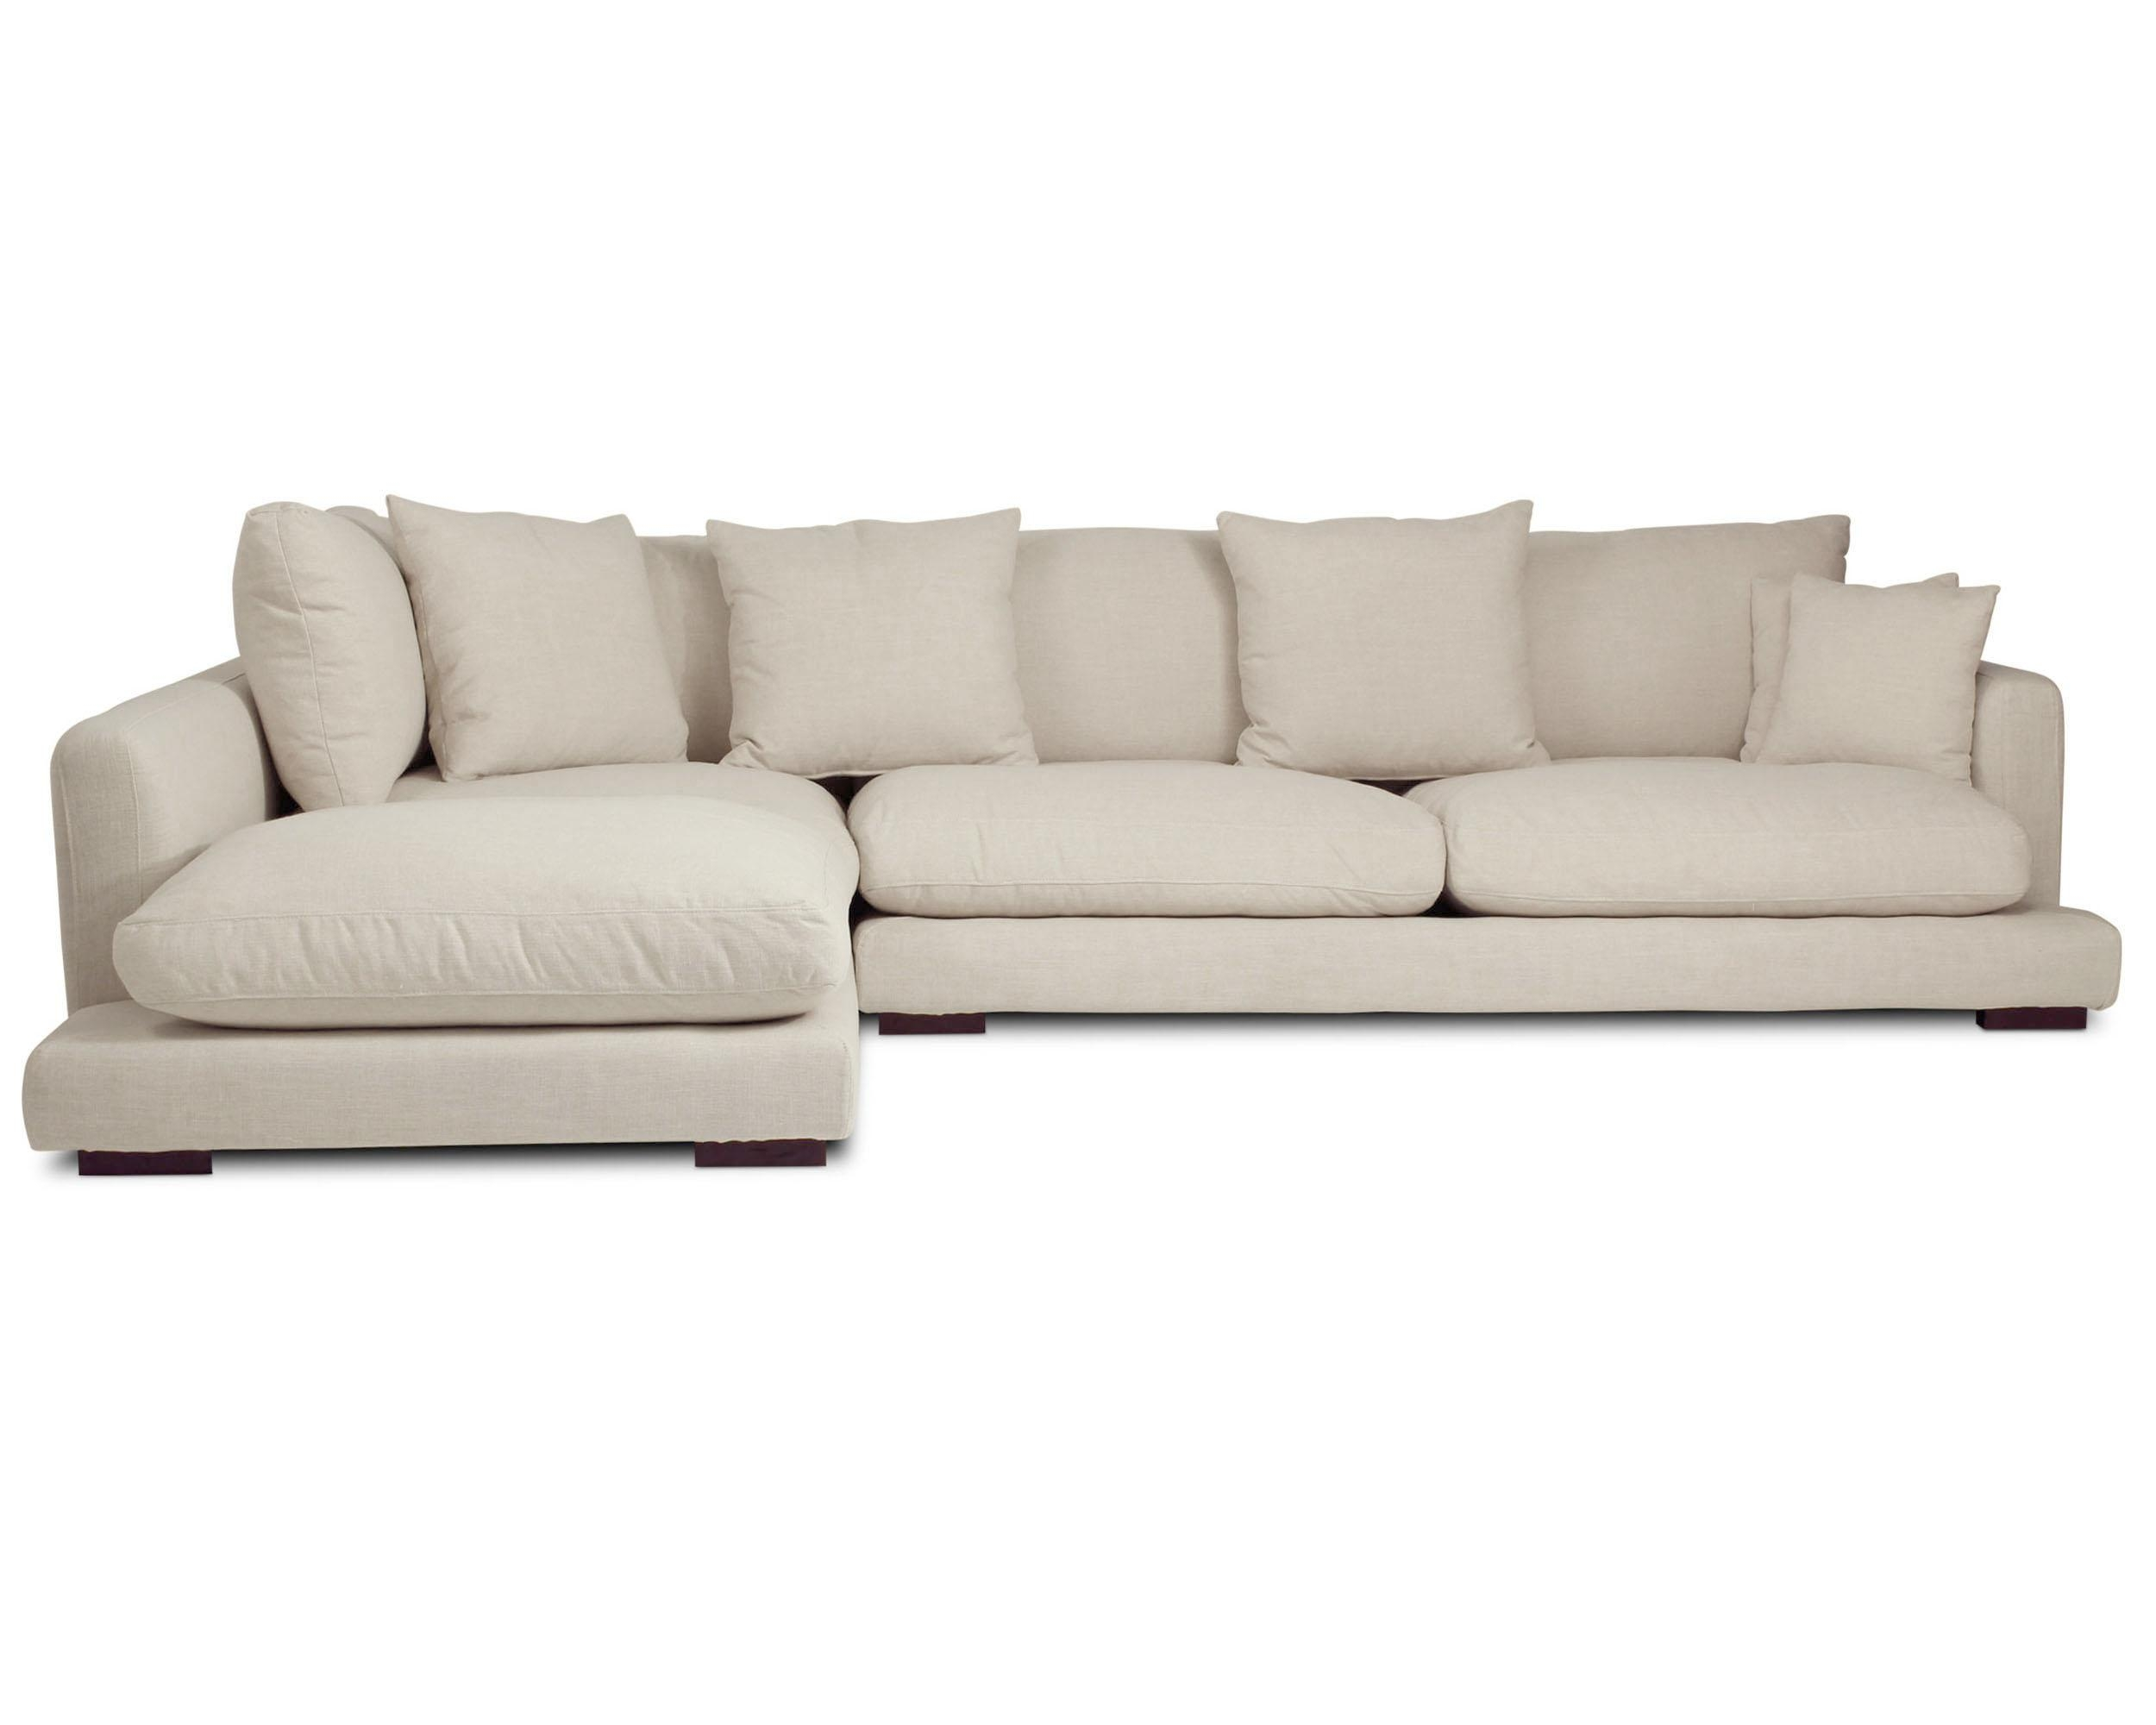 Long Sofa With Chaise 14 With Long Sofa With Chaise | Jinanhongyu For Long Chaise Sofa (View 6 of 20)